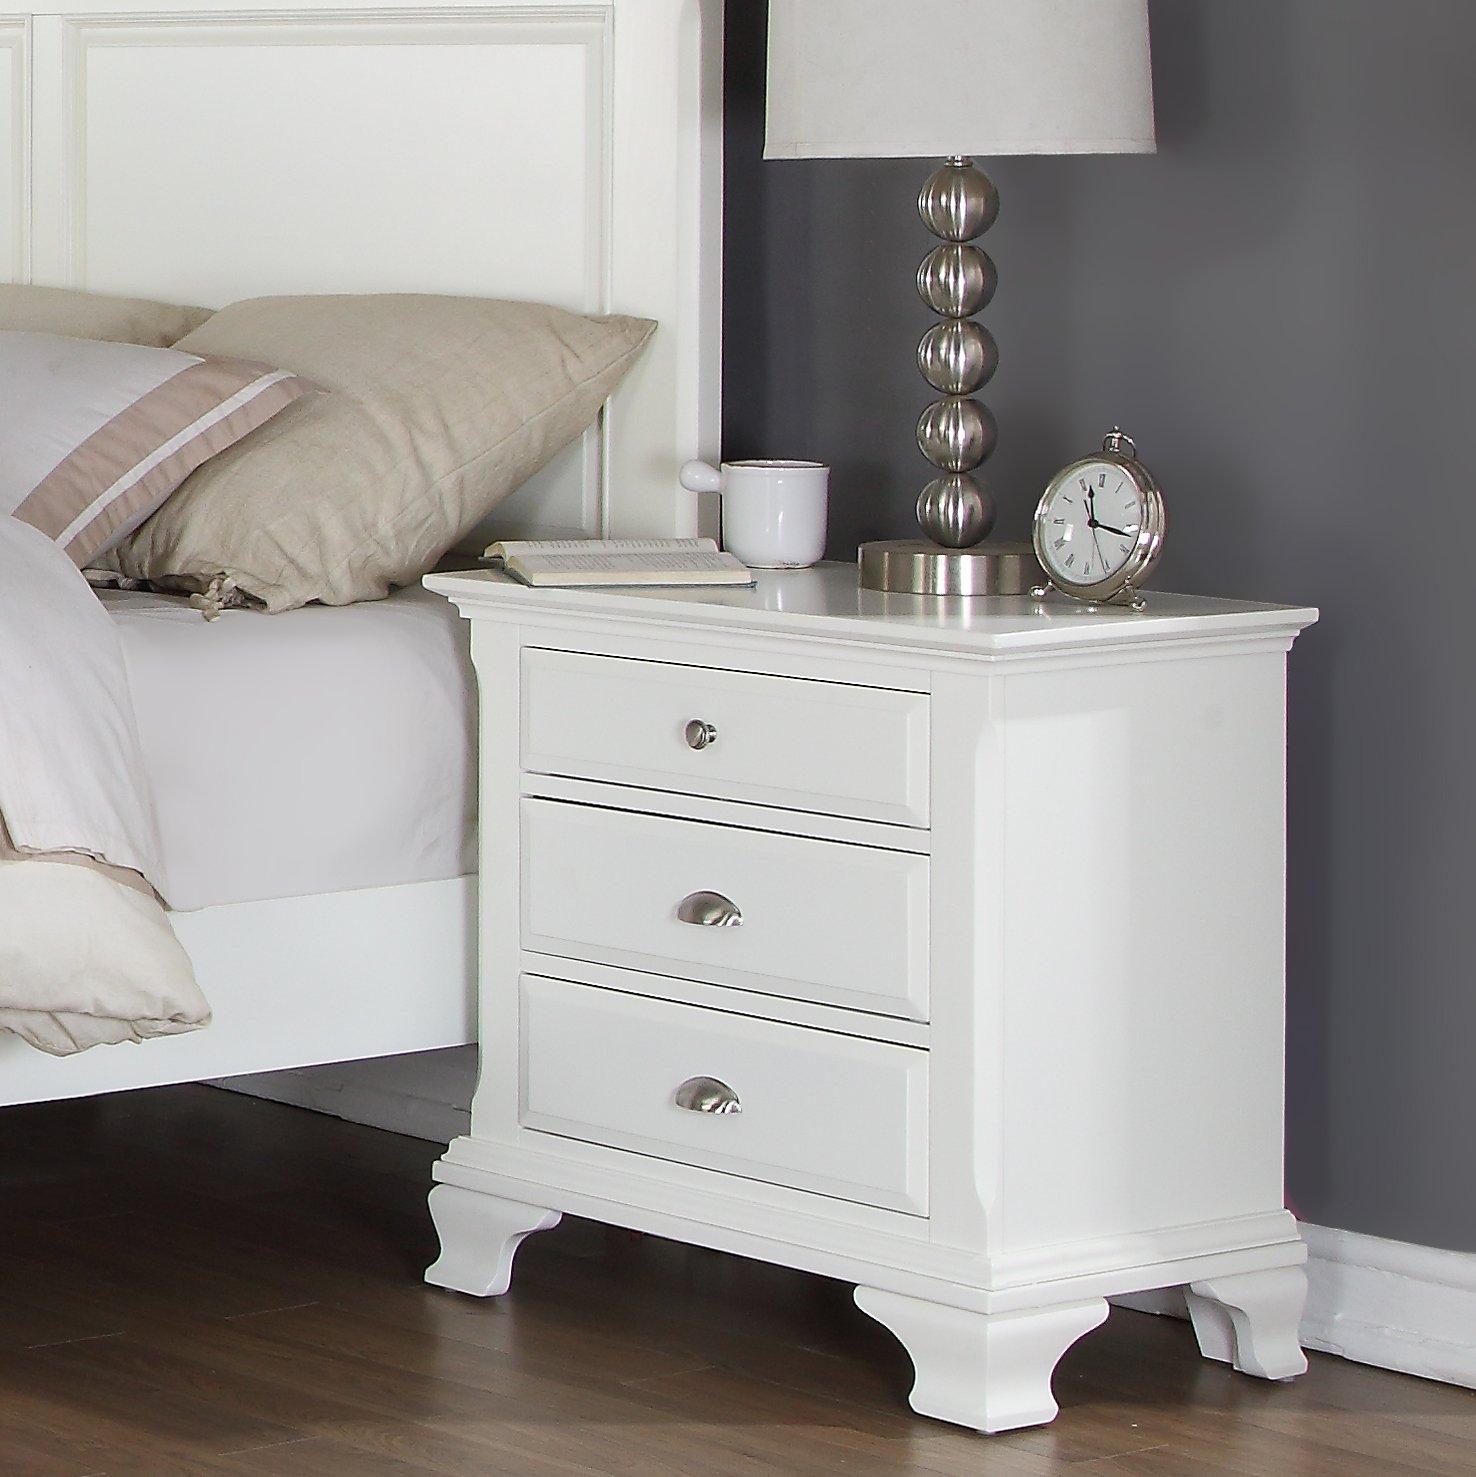 Amazon Roundhill Furniture Laveno 012 White Wood 3 Drawer